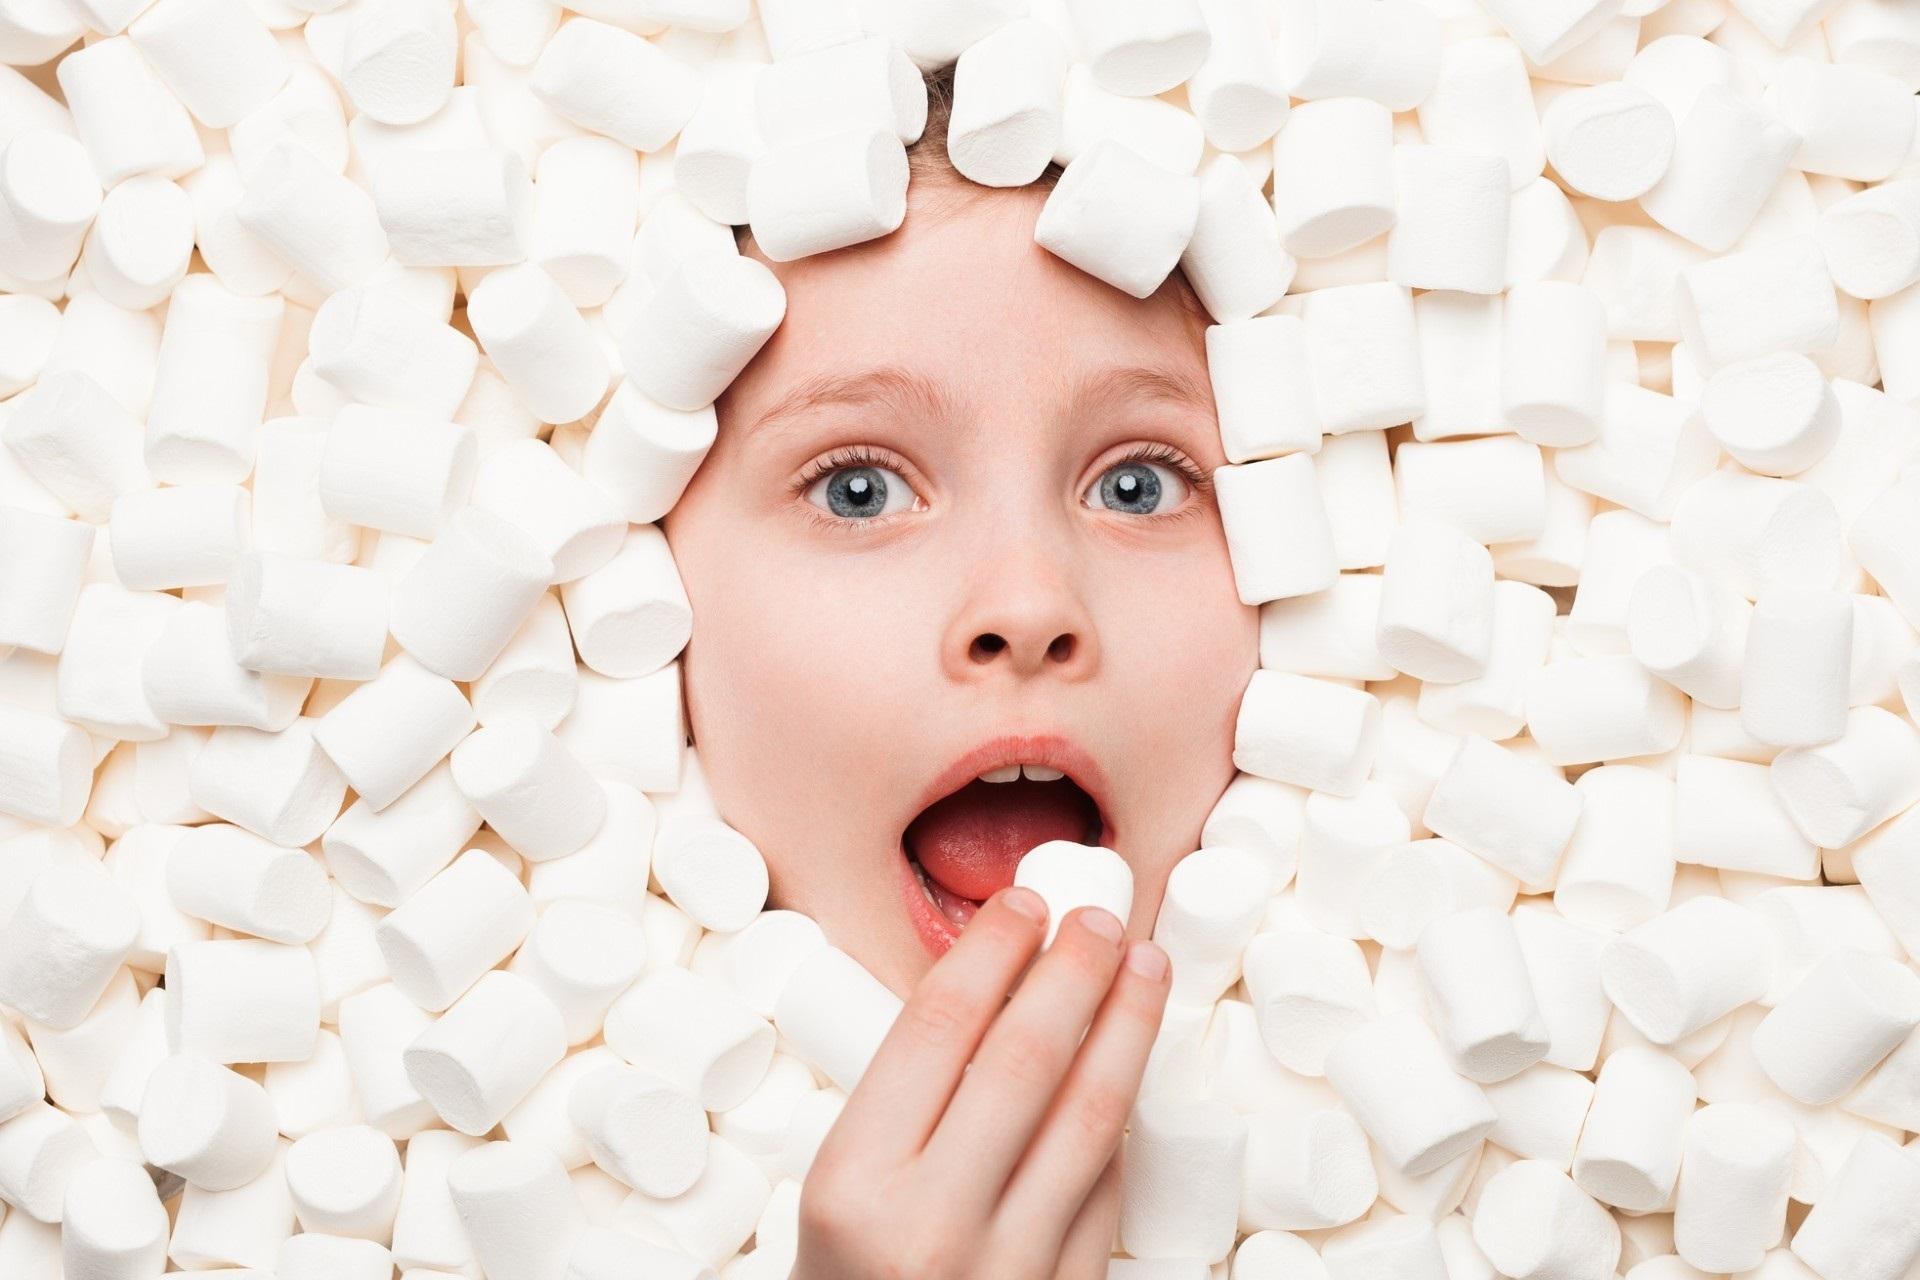 Resist the single marshmallow